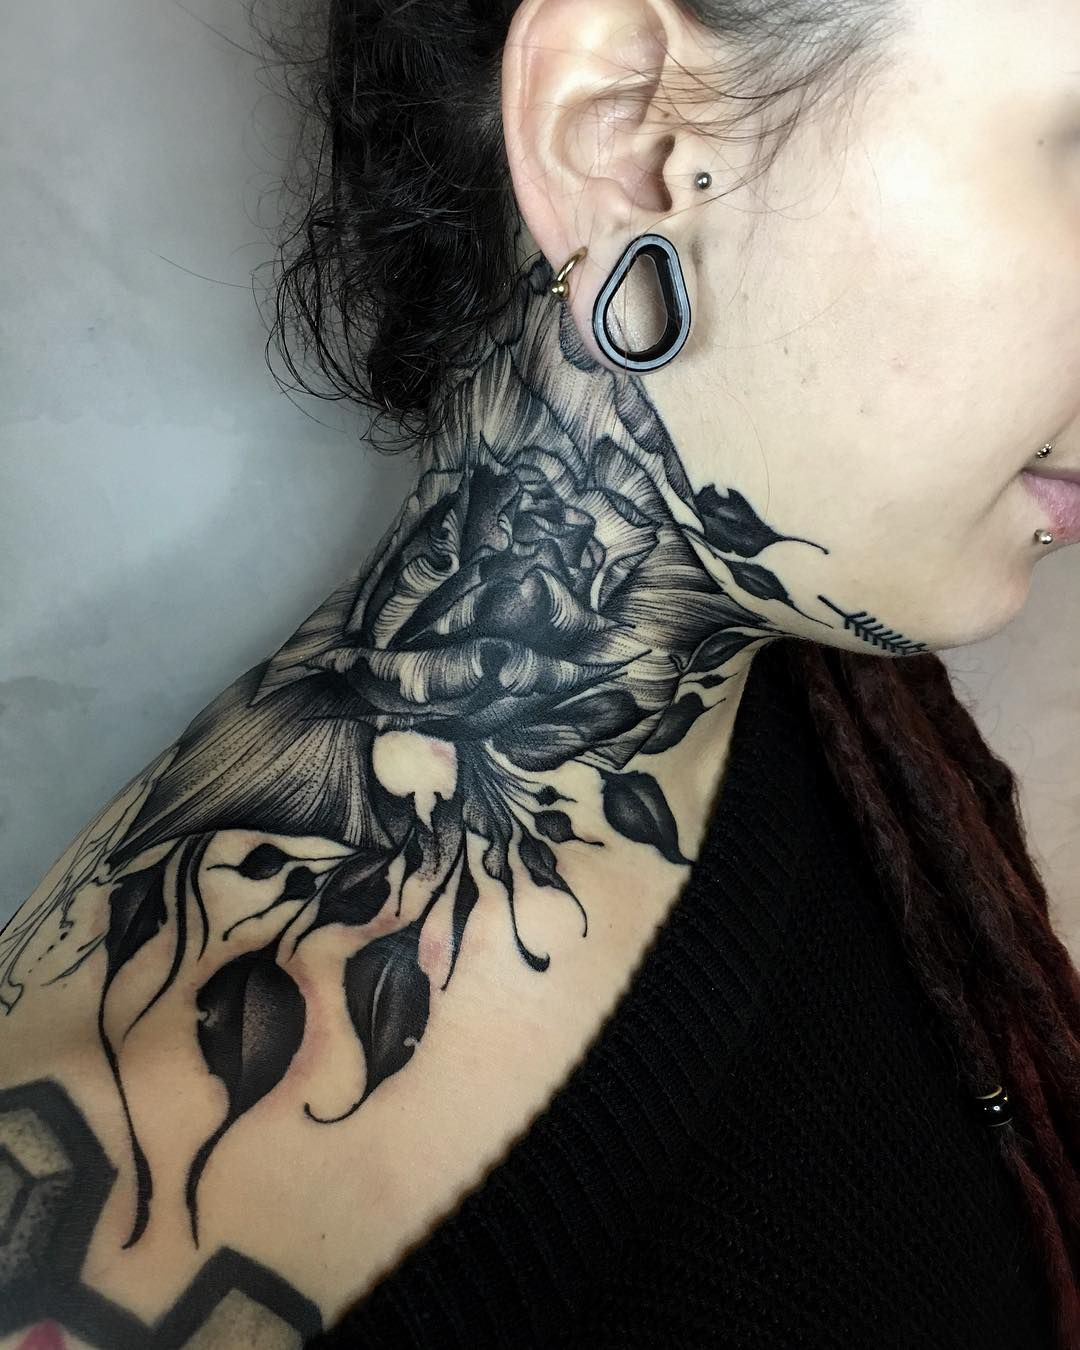 49+ Astonishing Best neck tattoos for ladies image ideas